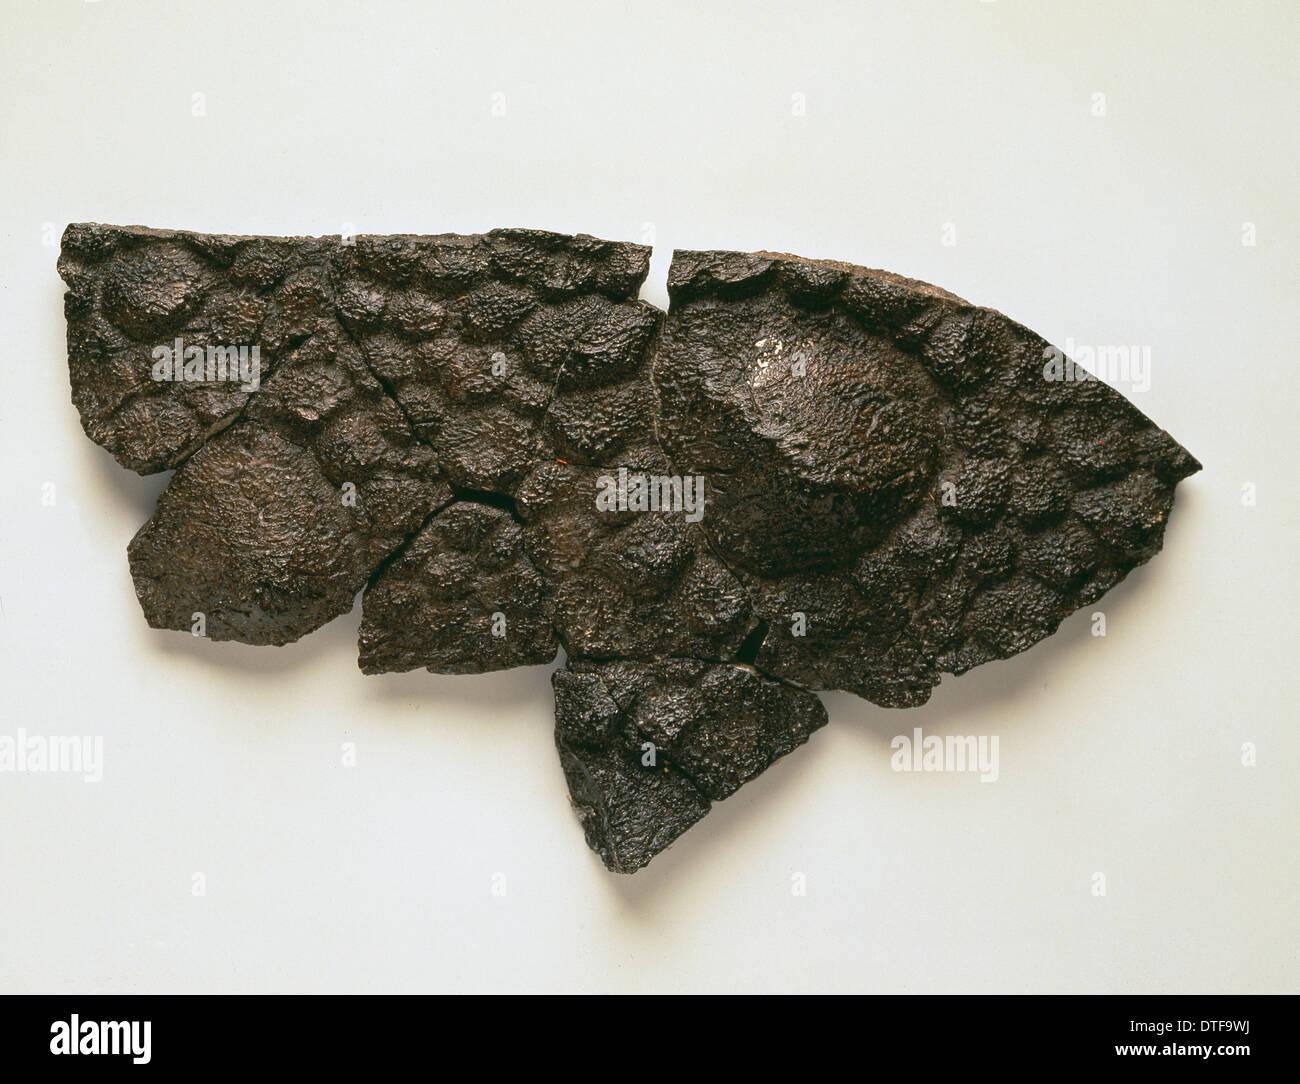 Polacanthus skin impression - Stock Image